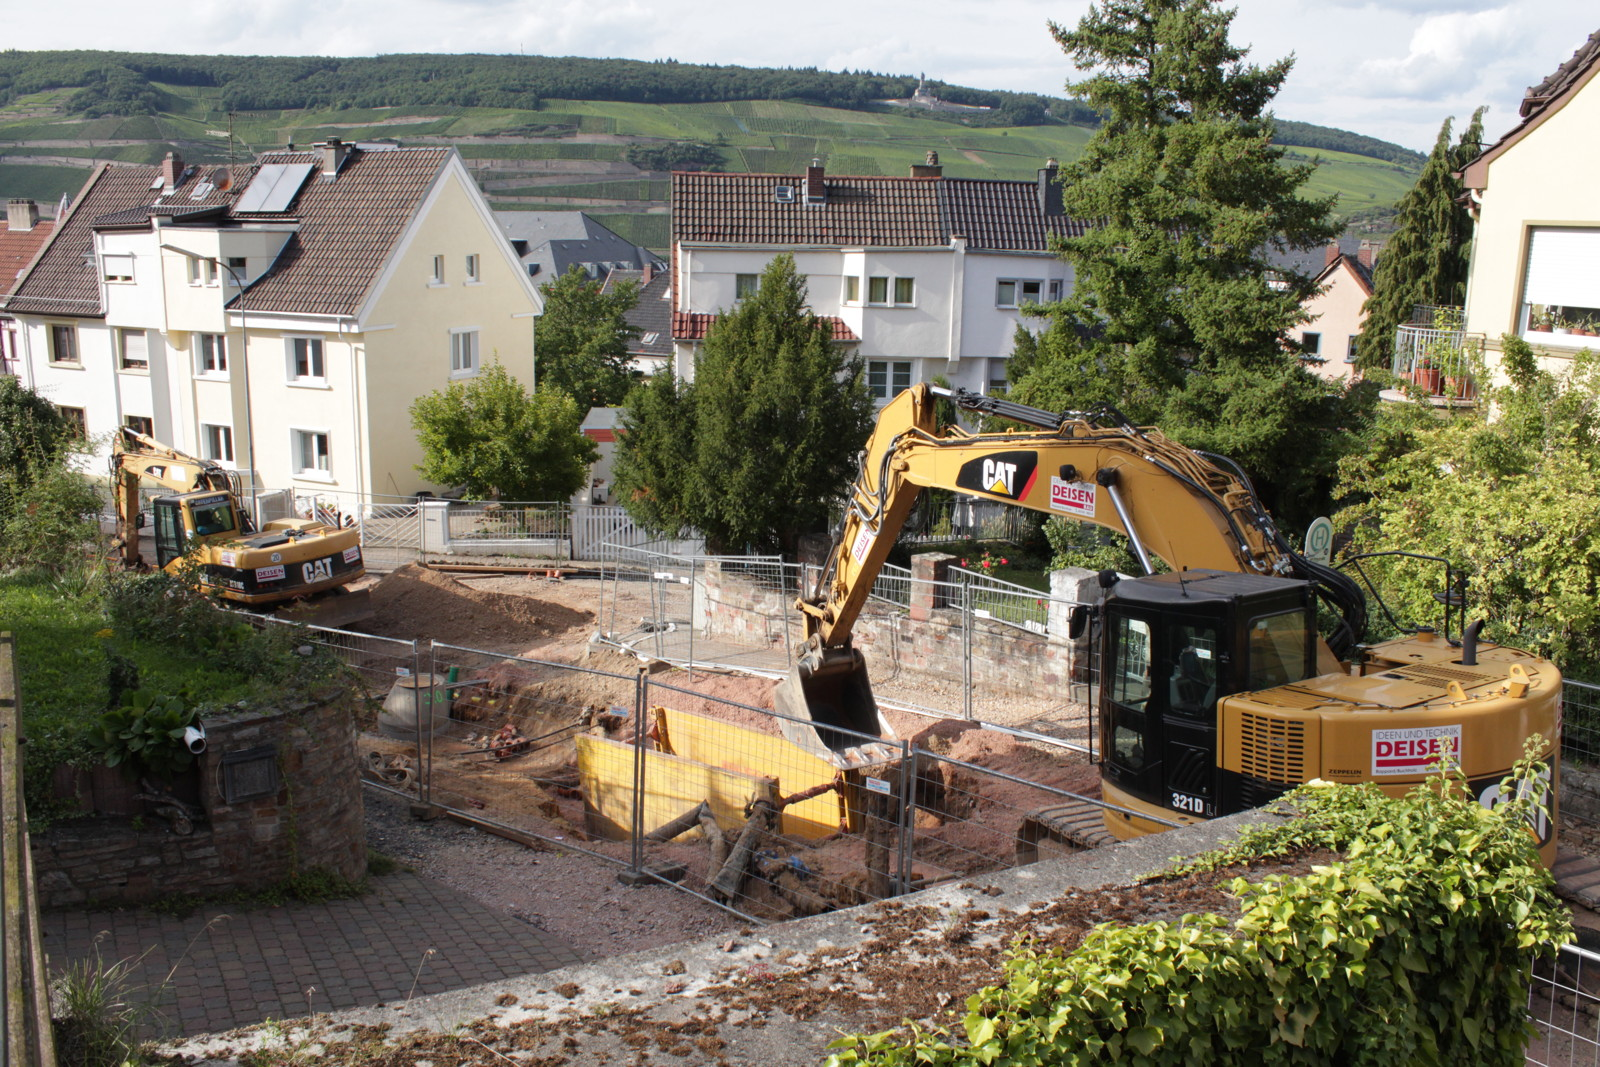 Baustelle – Waldstraße – Bingen am Rhein